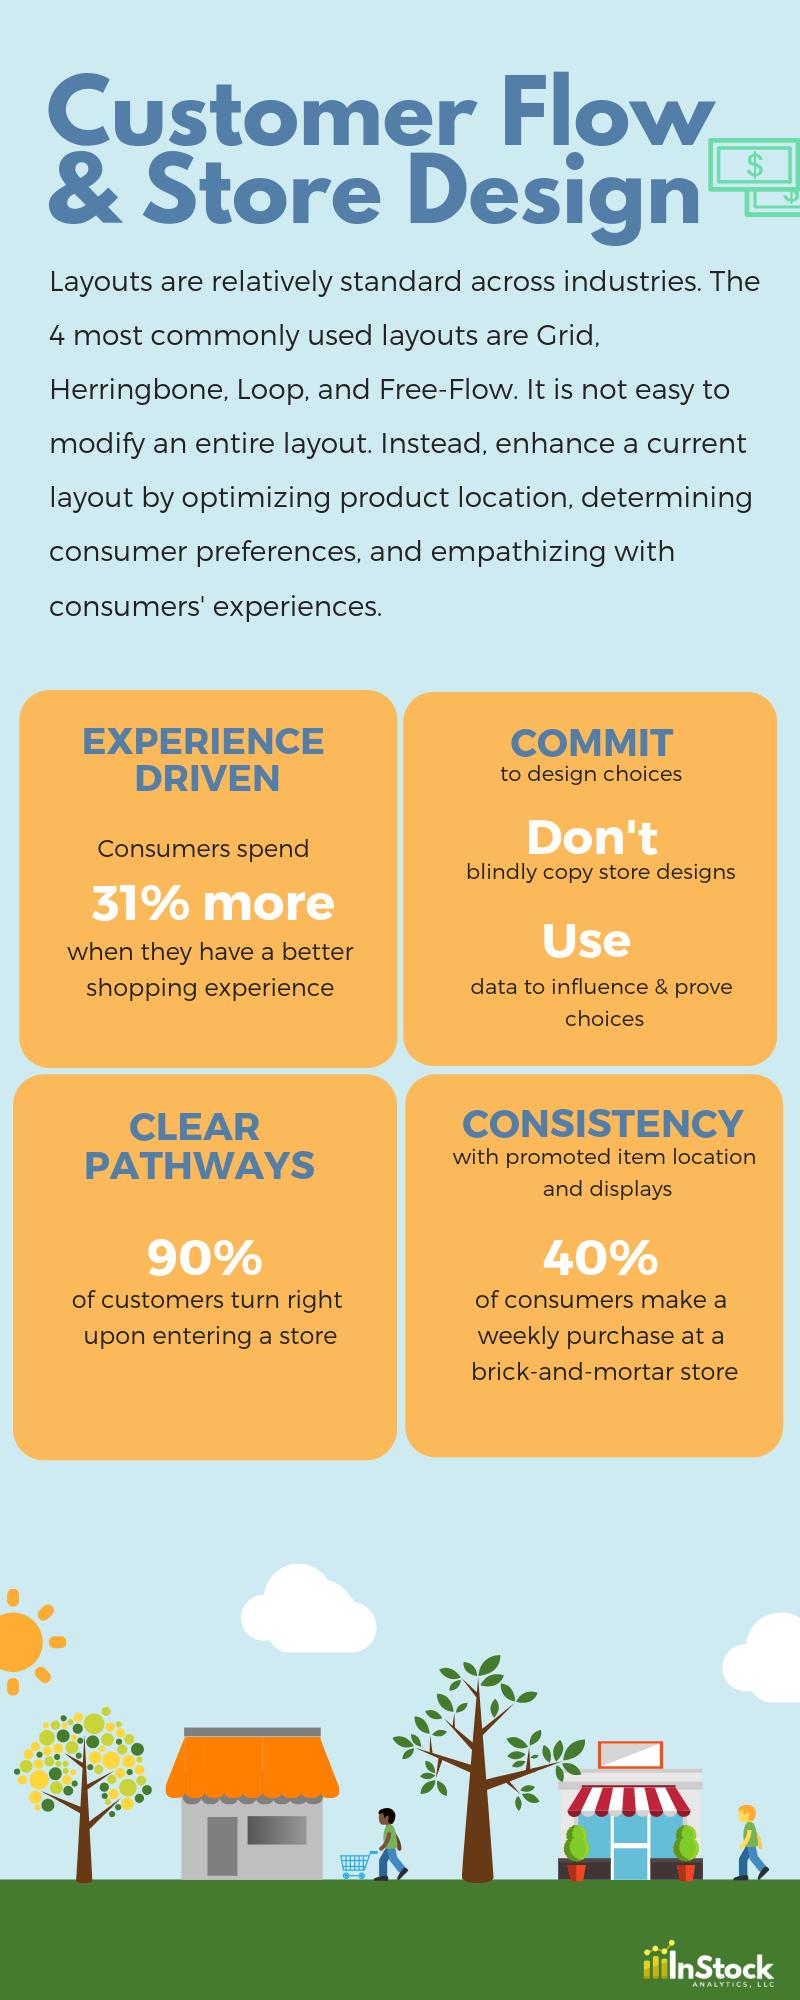 Customer Flow_Store Design.png